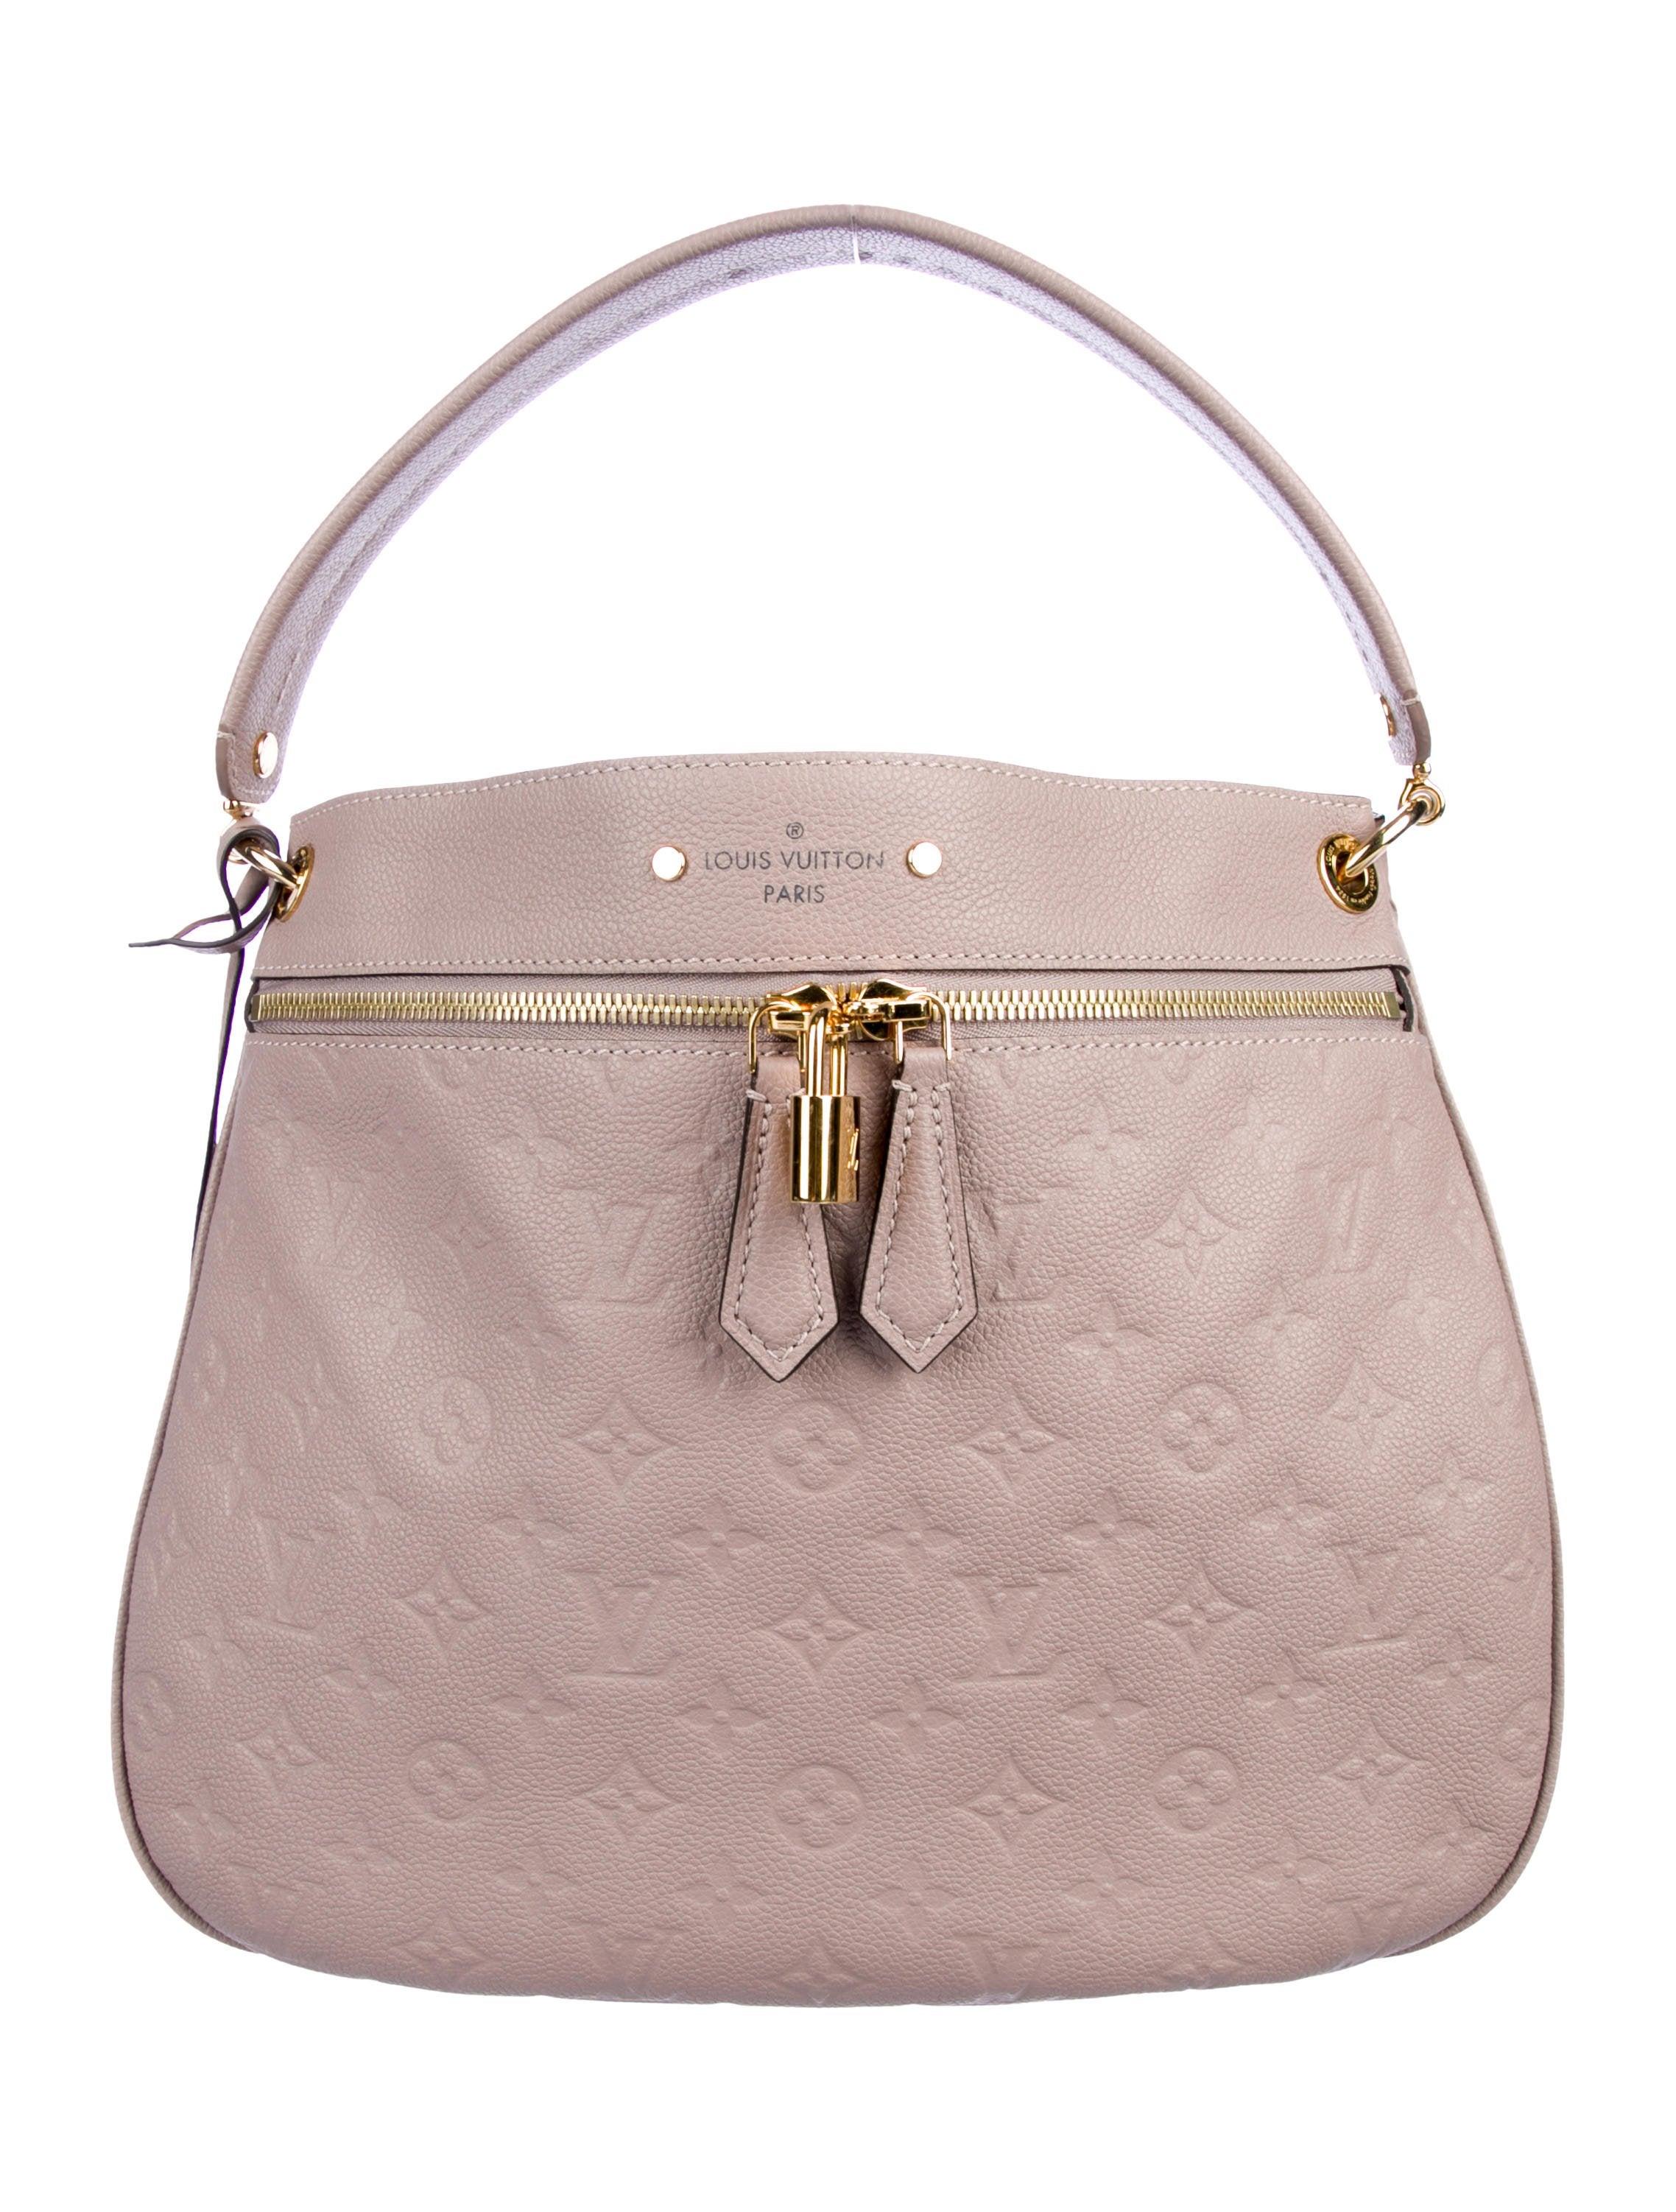 063fbda3ba6f Louis Vuitton Handbags